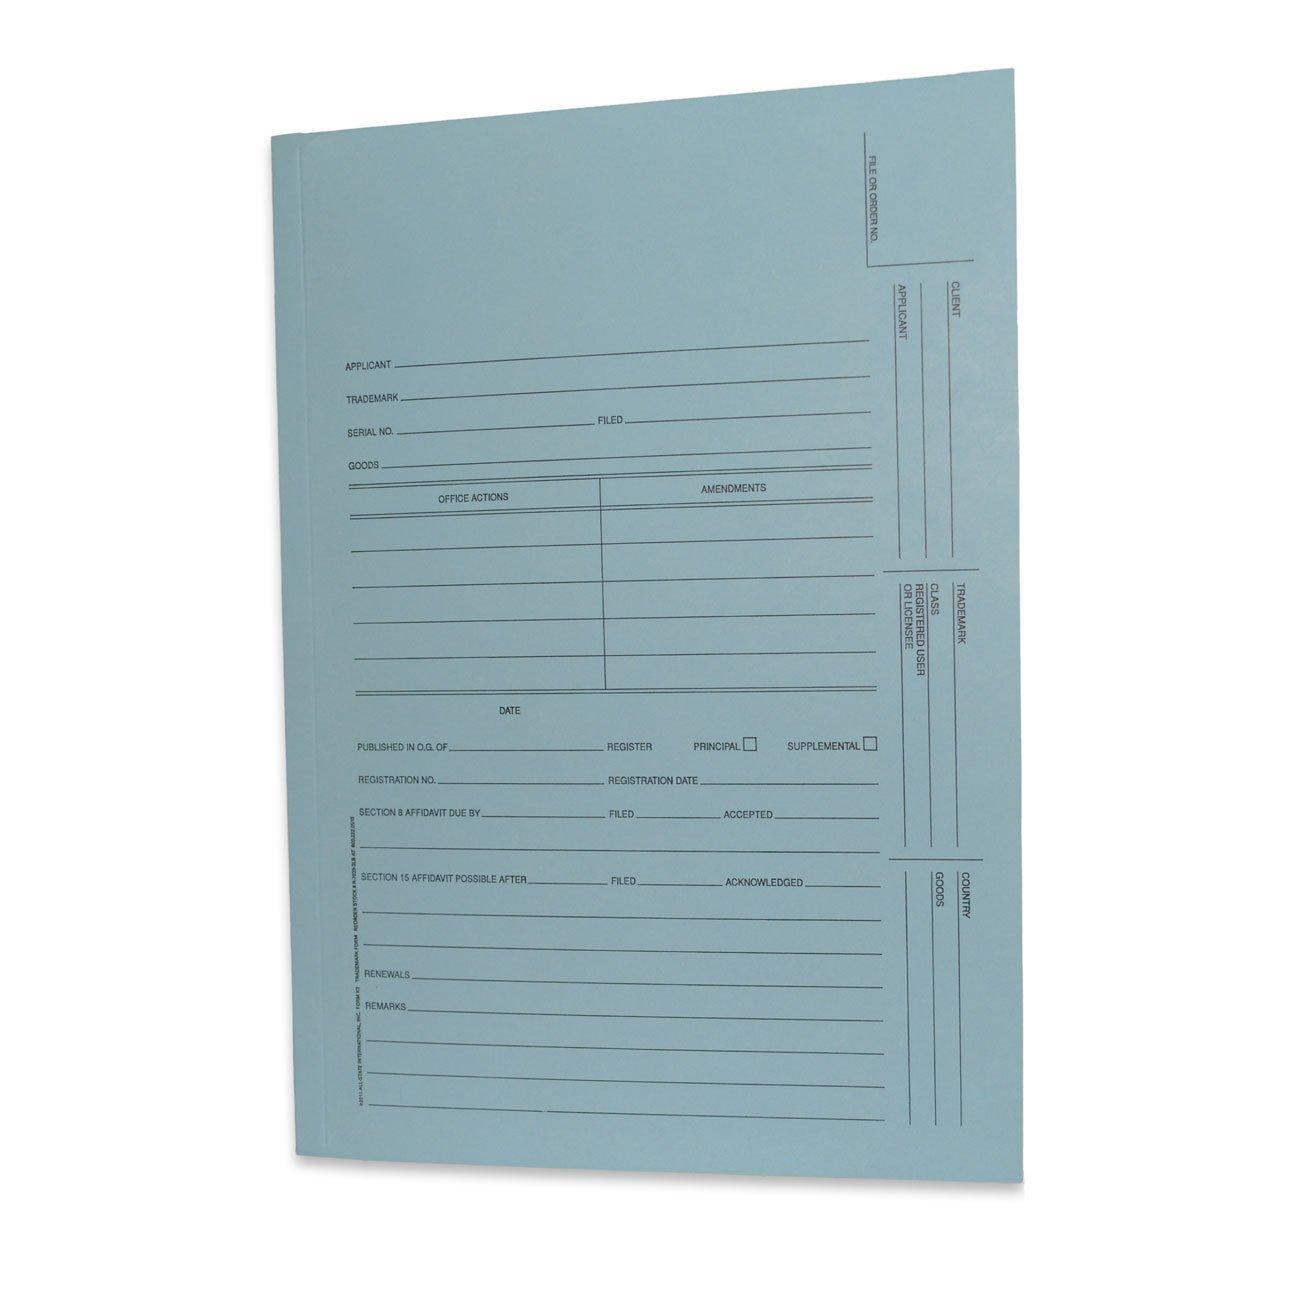 Kruysman/Redweld Trademark Folder, 3 Panel, 10 1/4'' x 14 1/2'' When Folded, Blue, 100 per Box